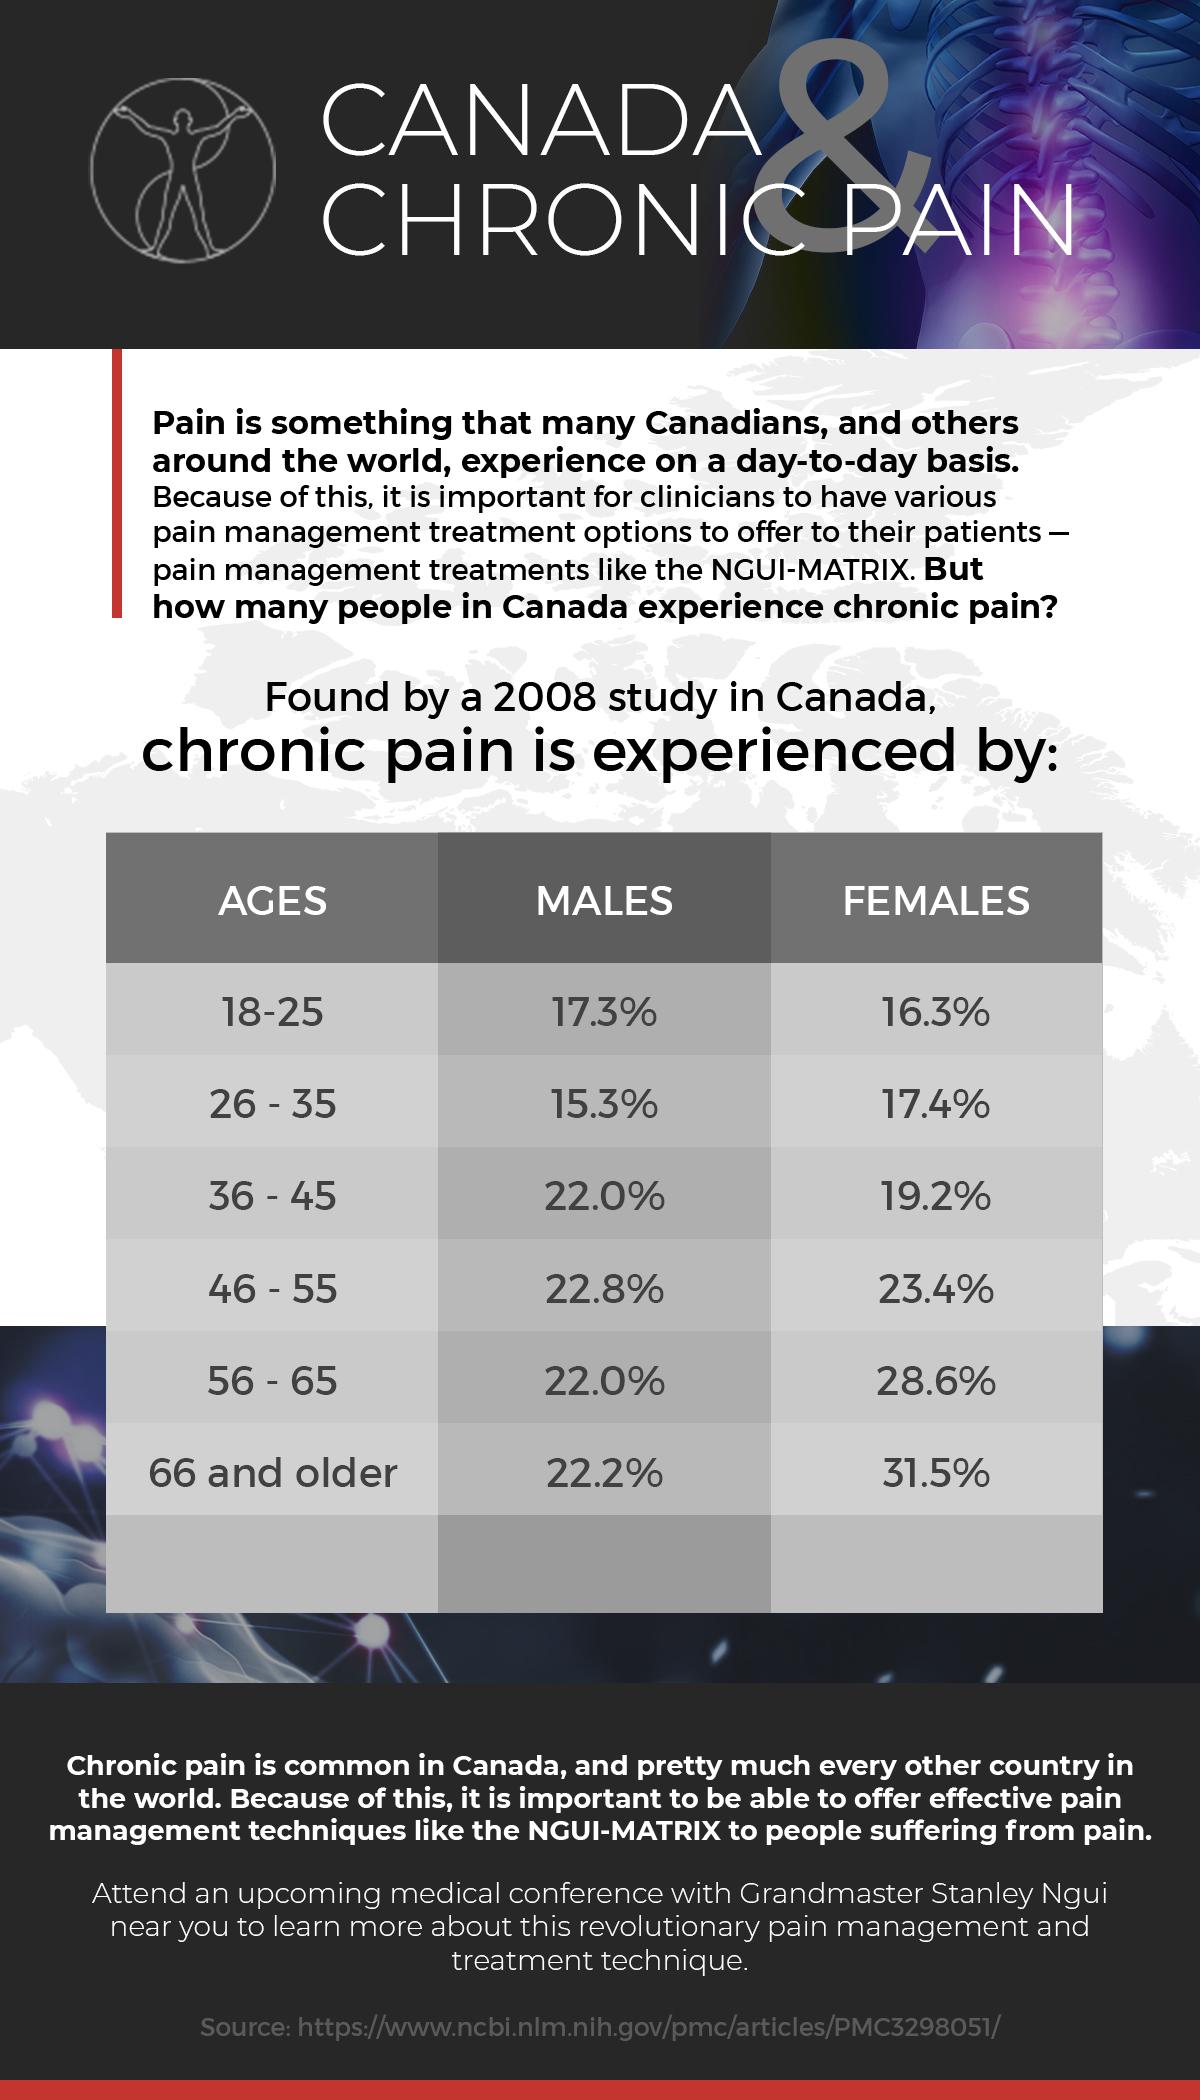 Canada & Chronic Pain